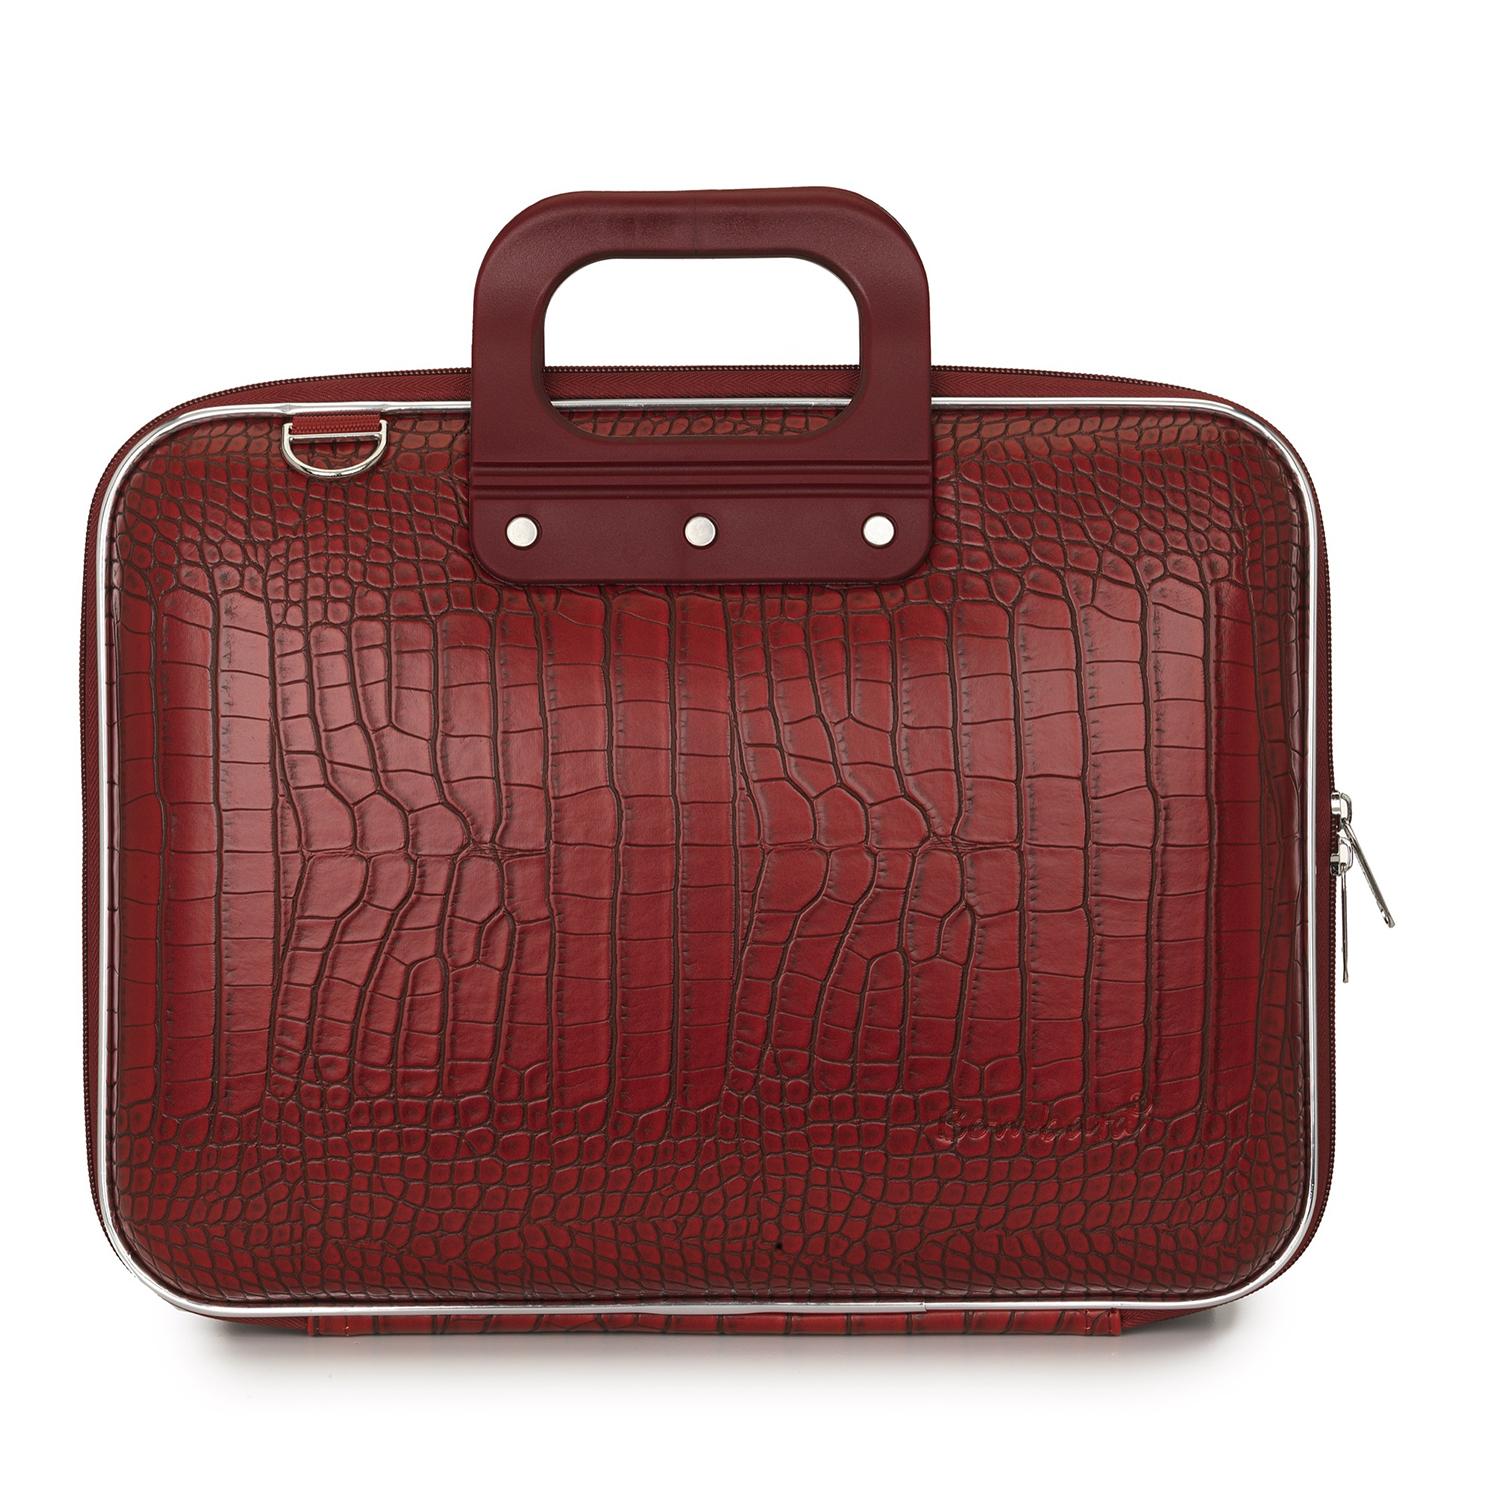 Bombata – Red Medio Cocco 13″ Laptop Case/Bag with Shoulder Strap